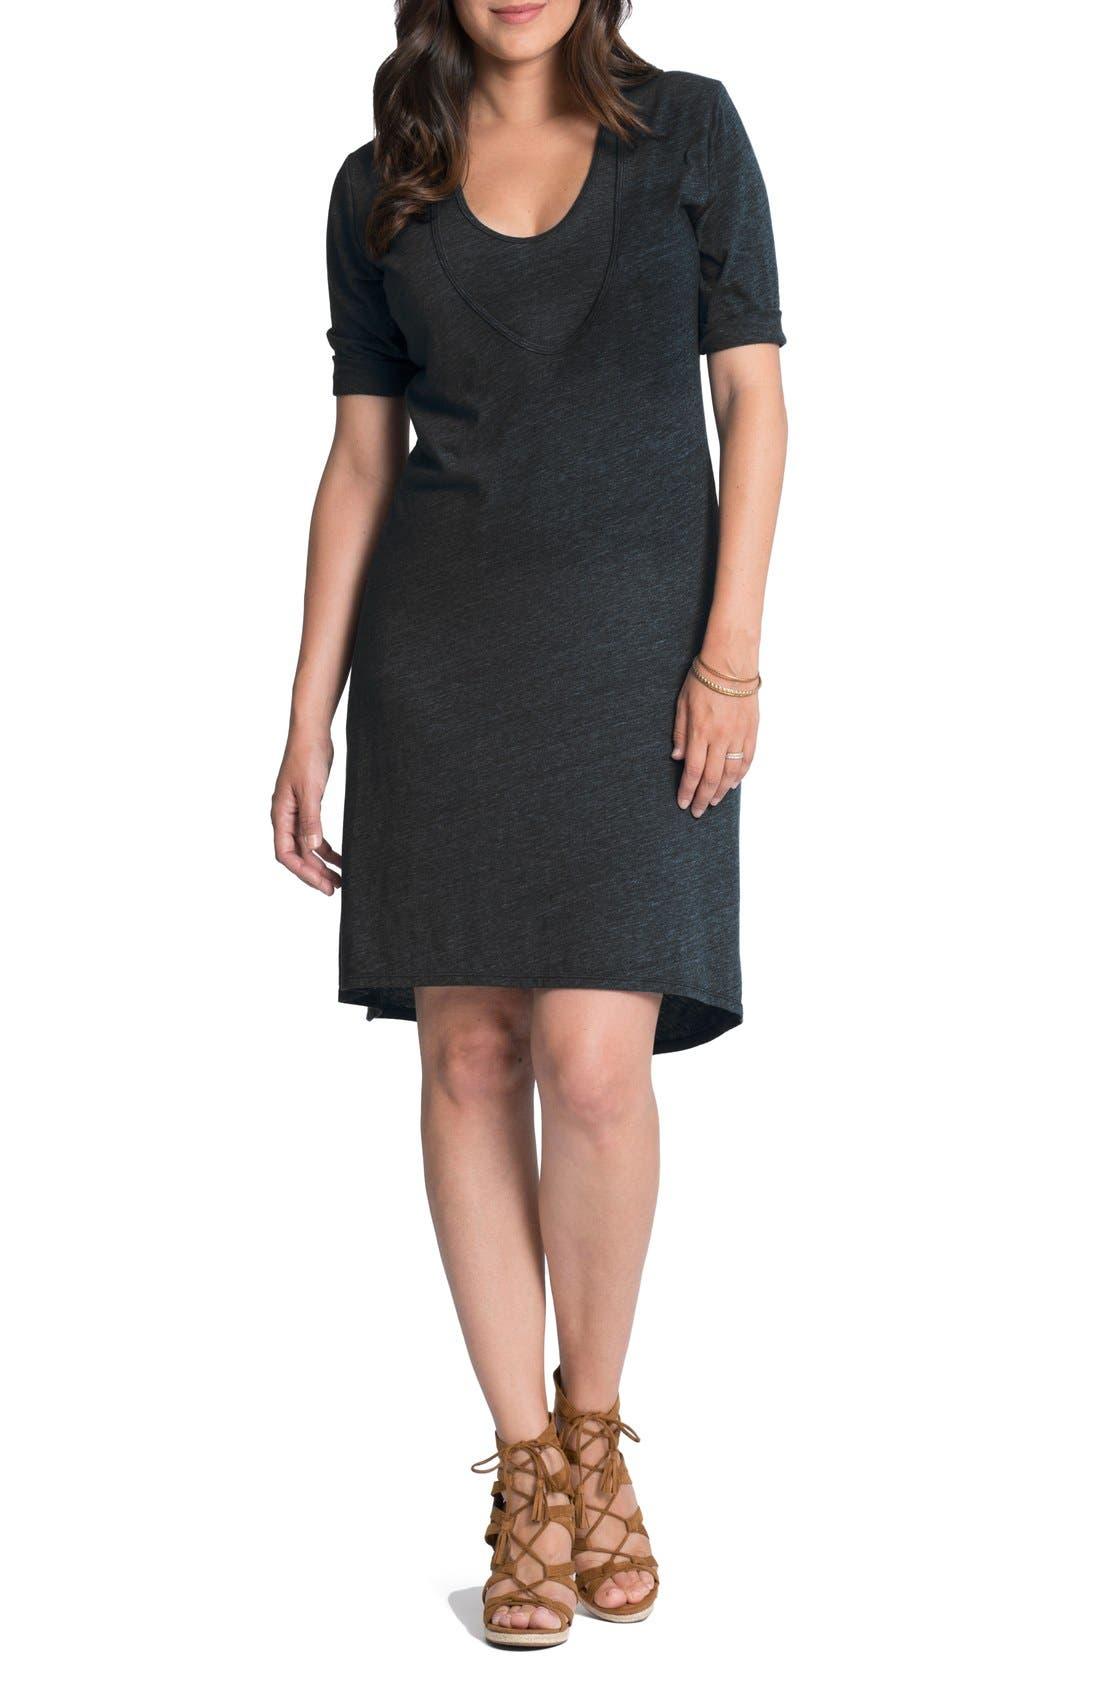 Bun Maternity Maternity/Nursing Shift Dress